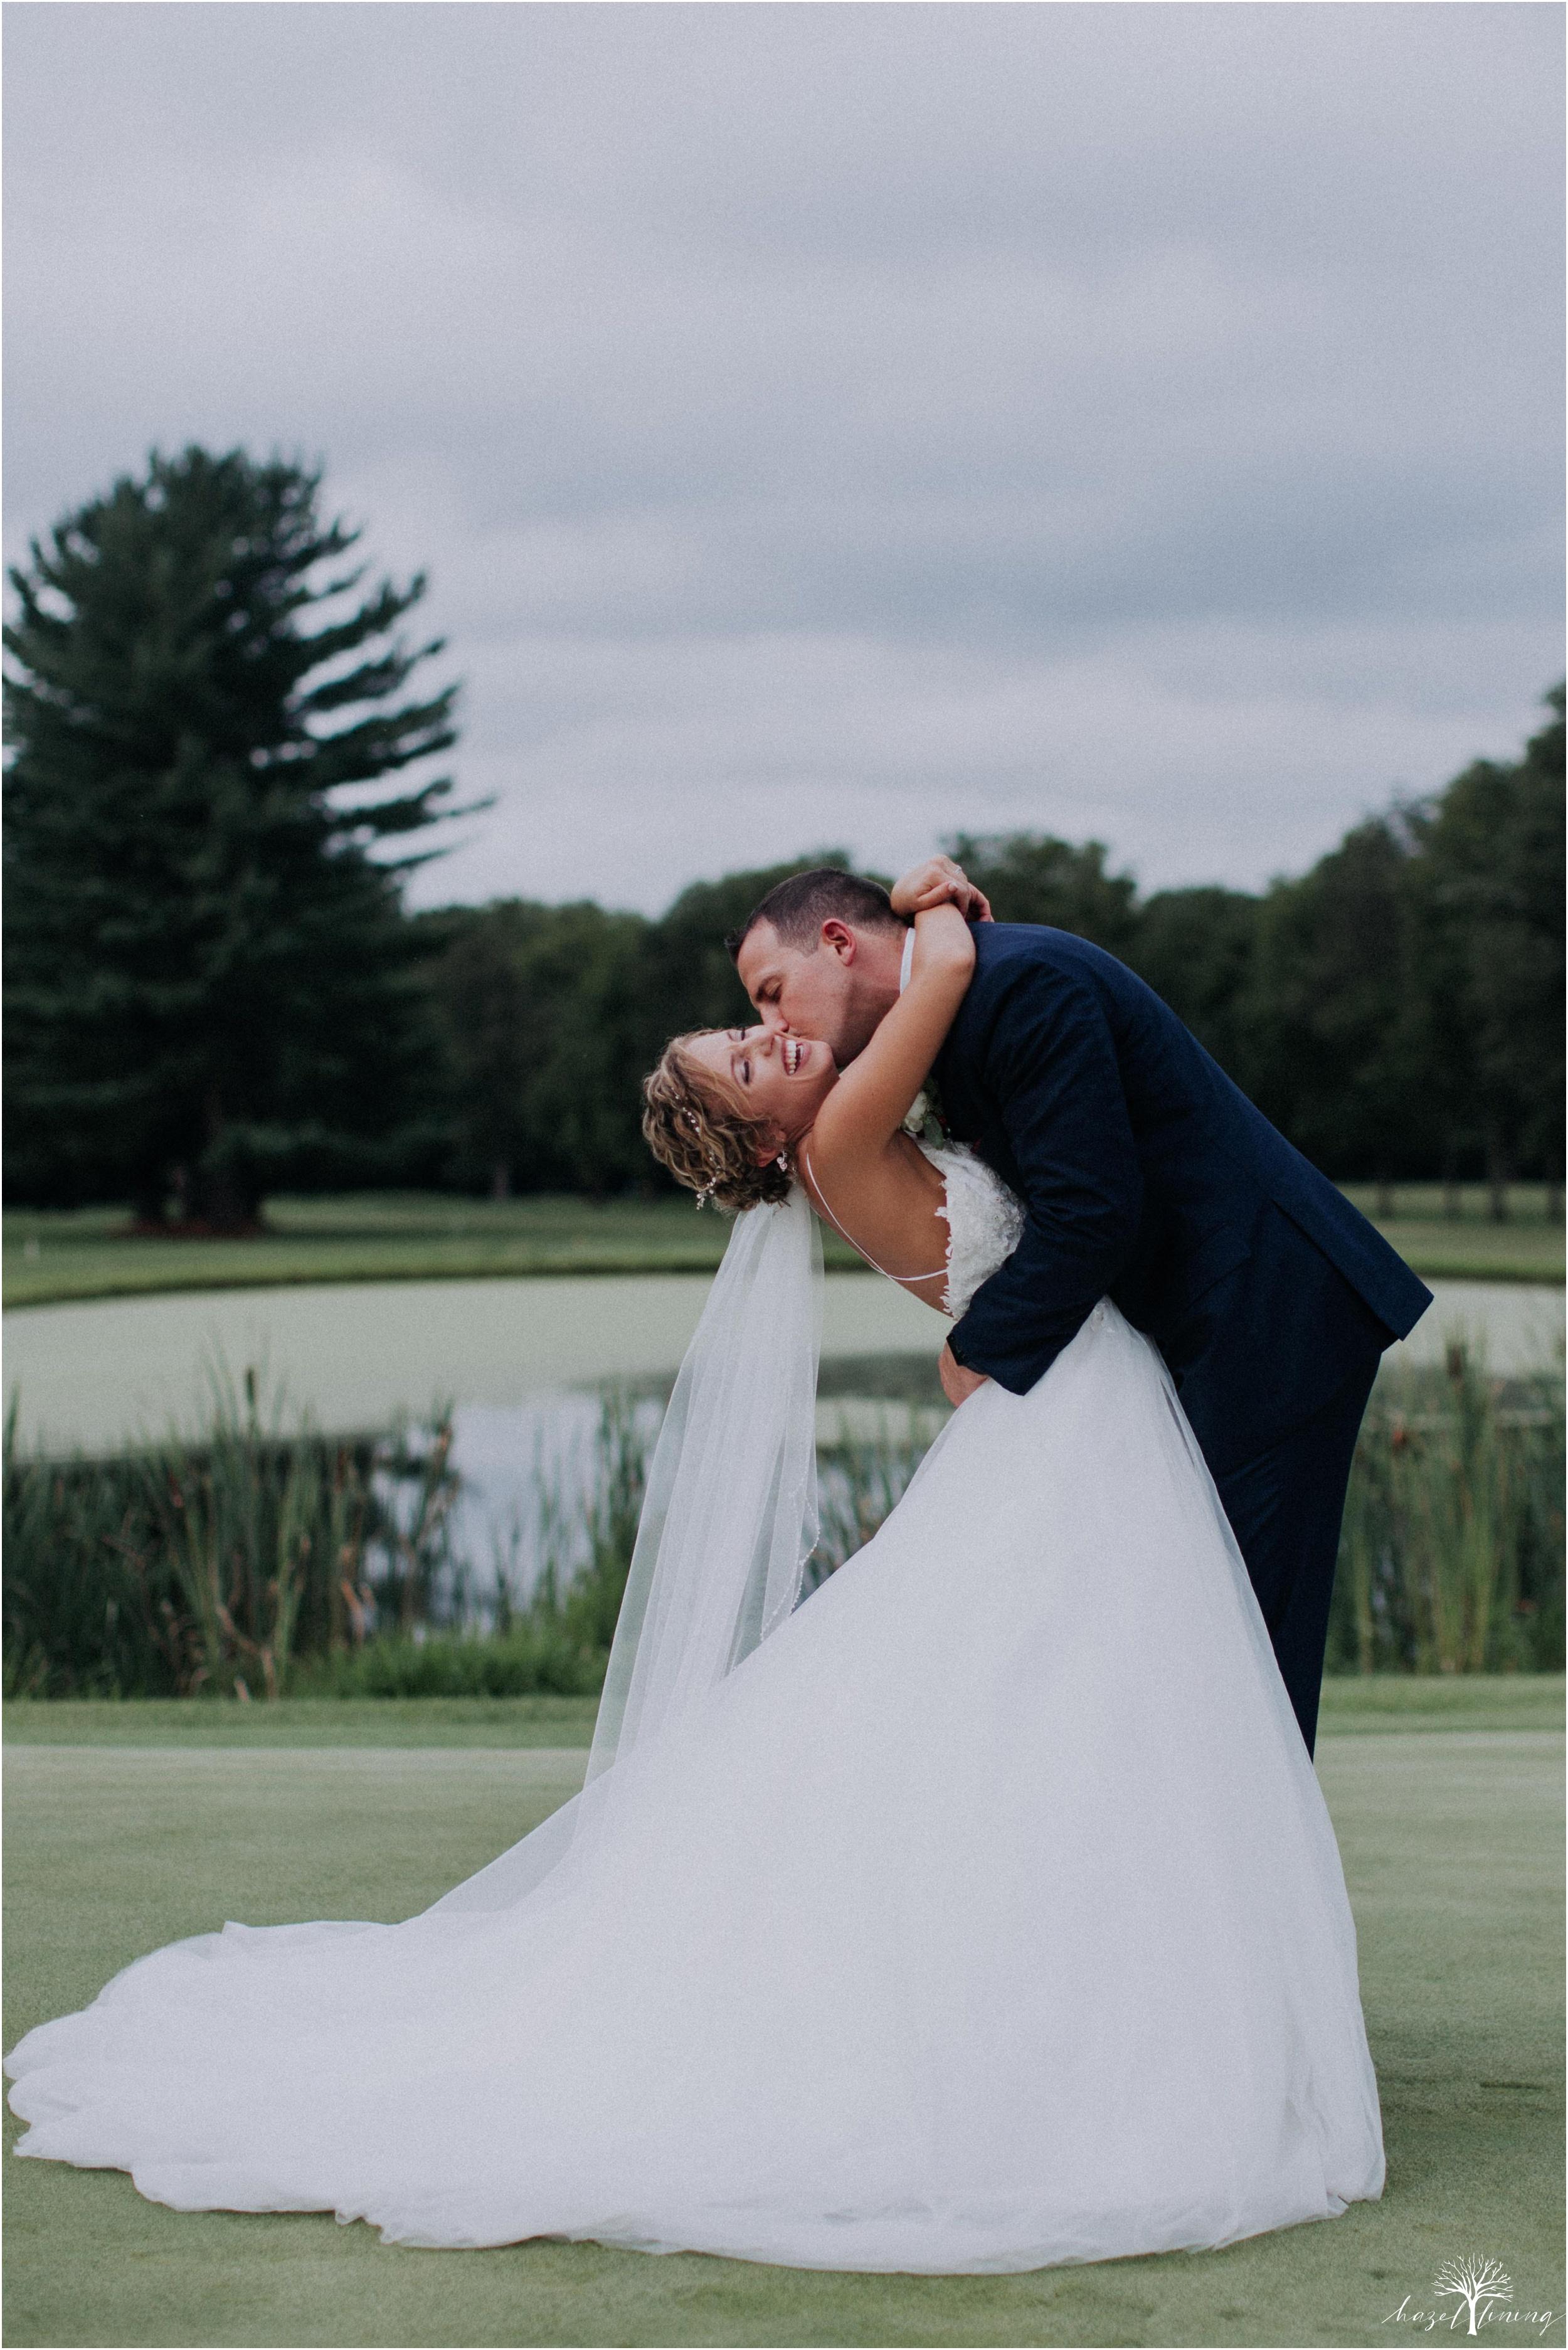 jonathan-weibel-becky-haywood-loft-at-sweetwater-cc-pennsburg-pennsylvania-rainy-day-summer-wedding-hazel-lining-travel-wedding-elopement-photography_0091.jpg